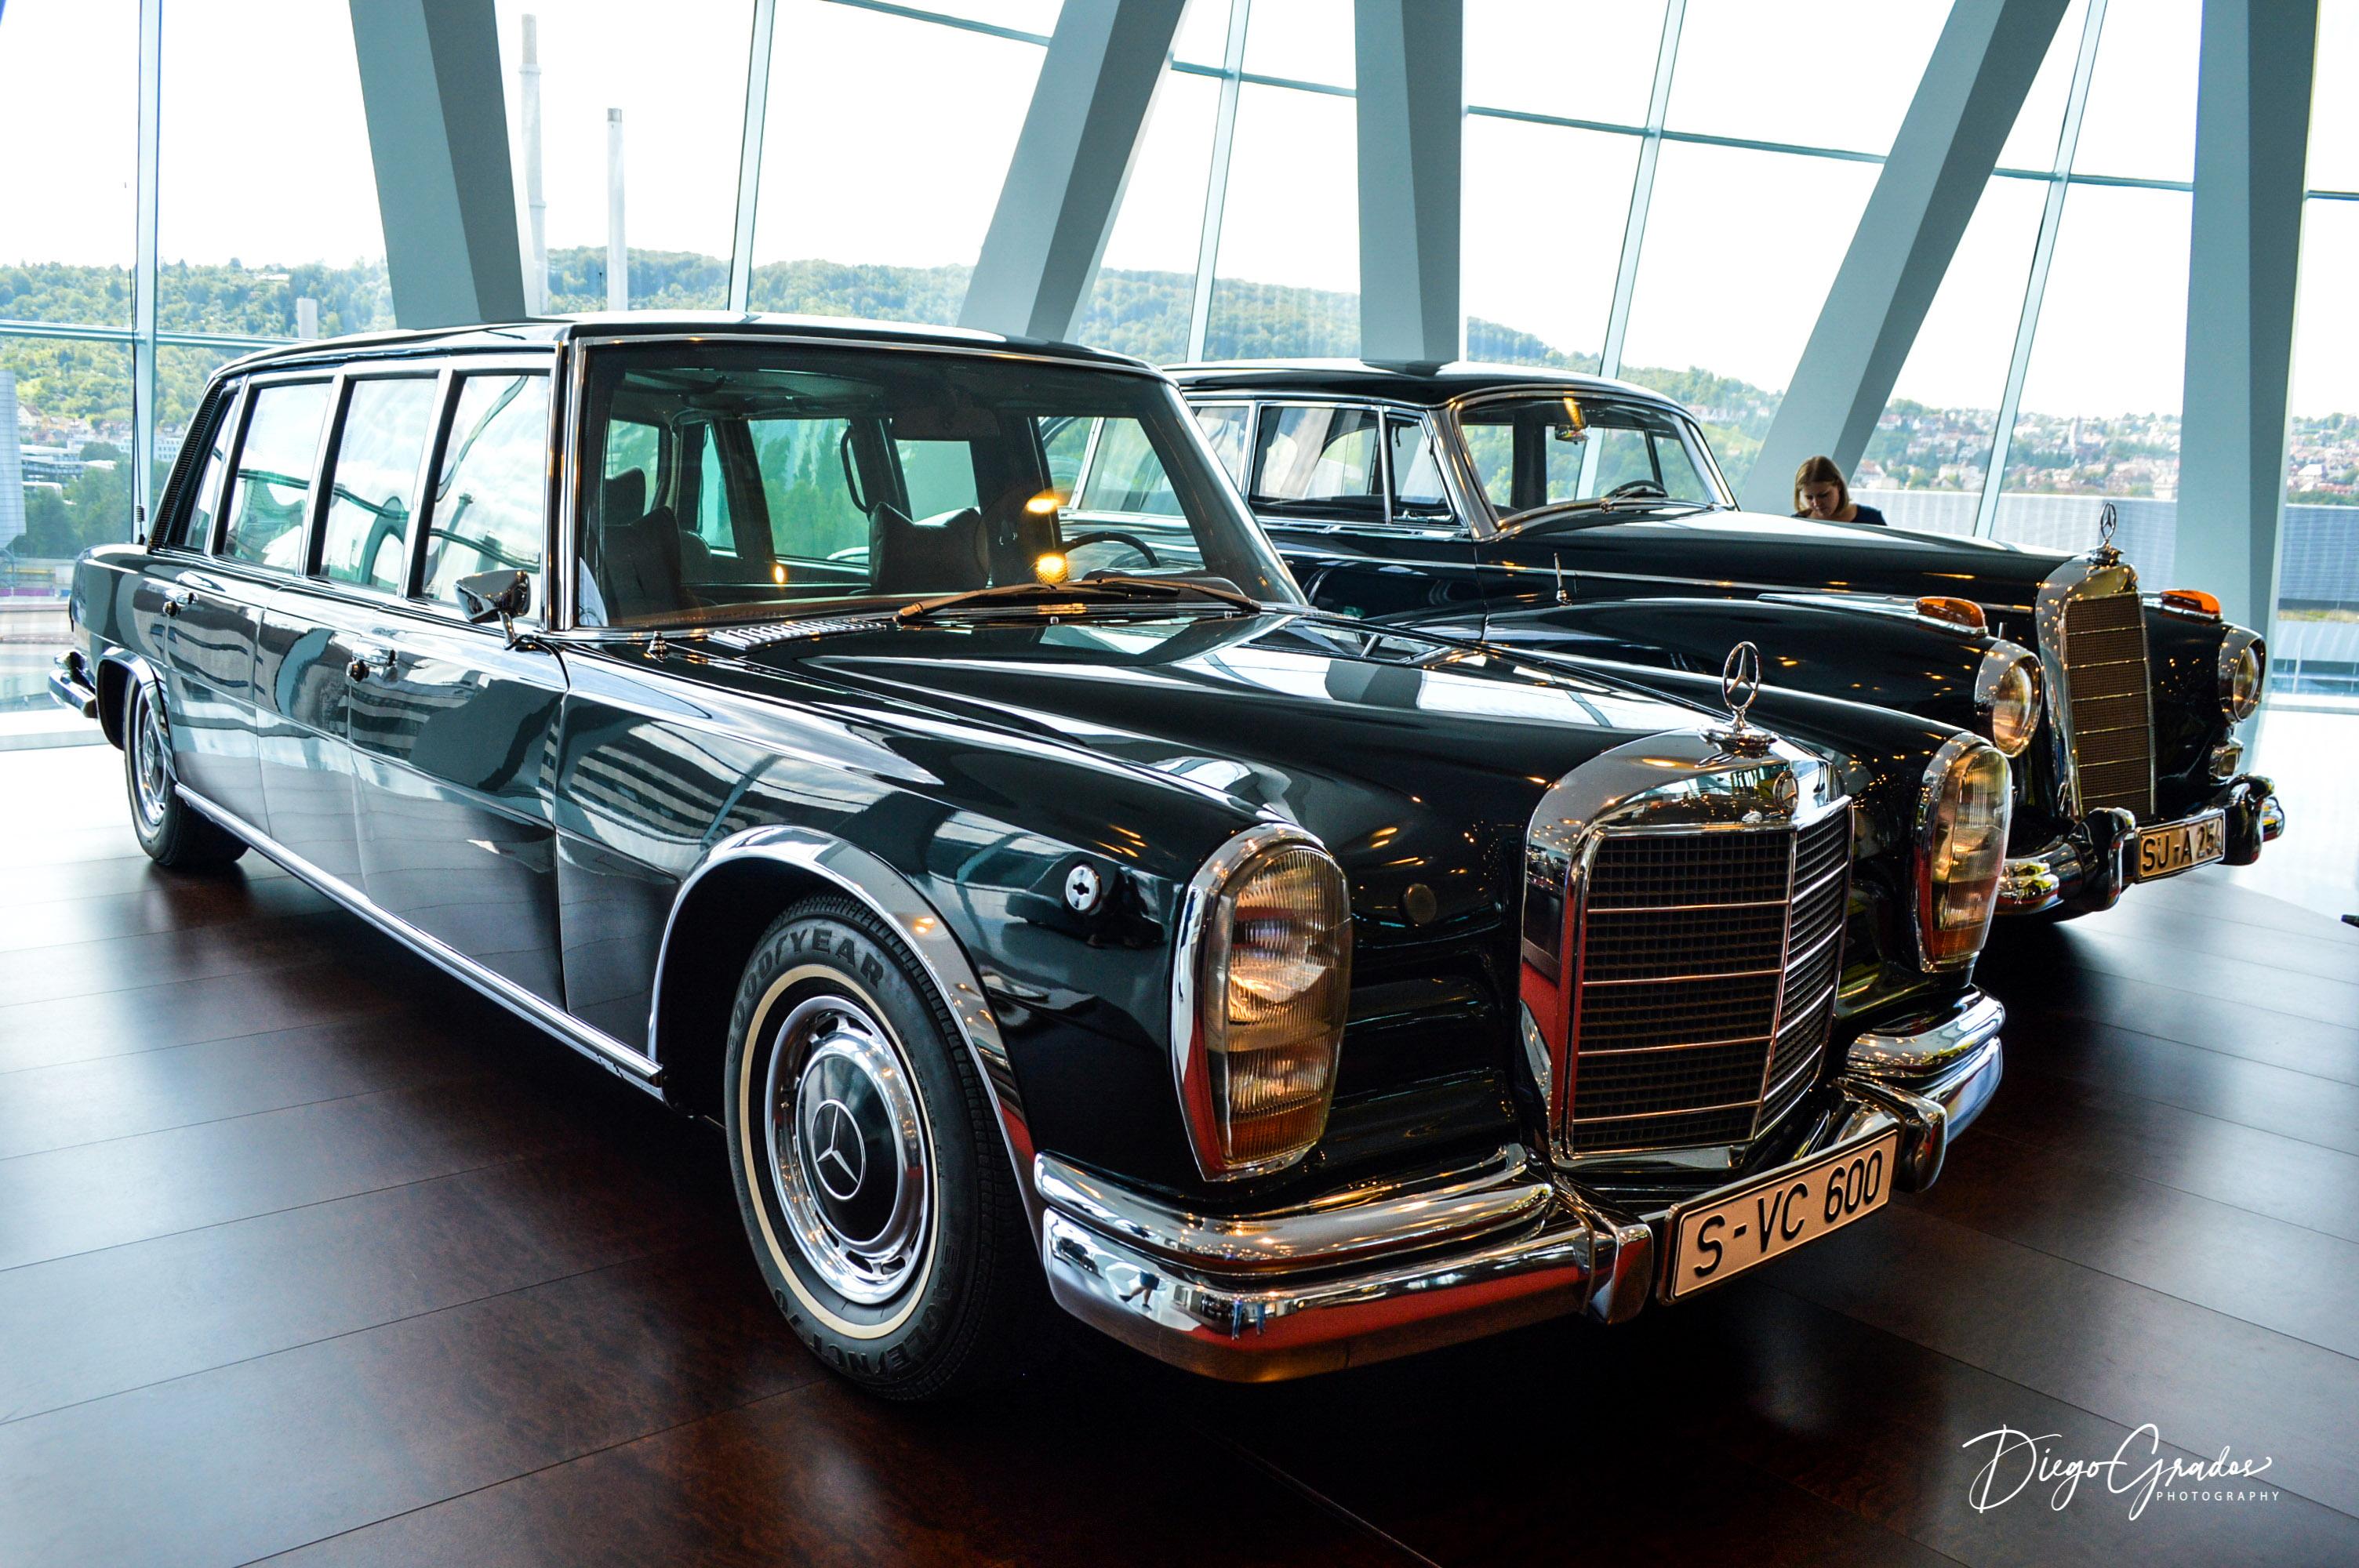 Mercedes-Benz 600 Pullman State Limousine